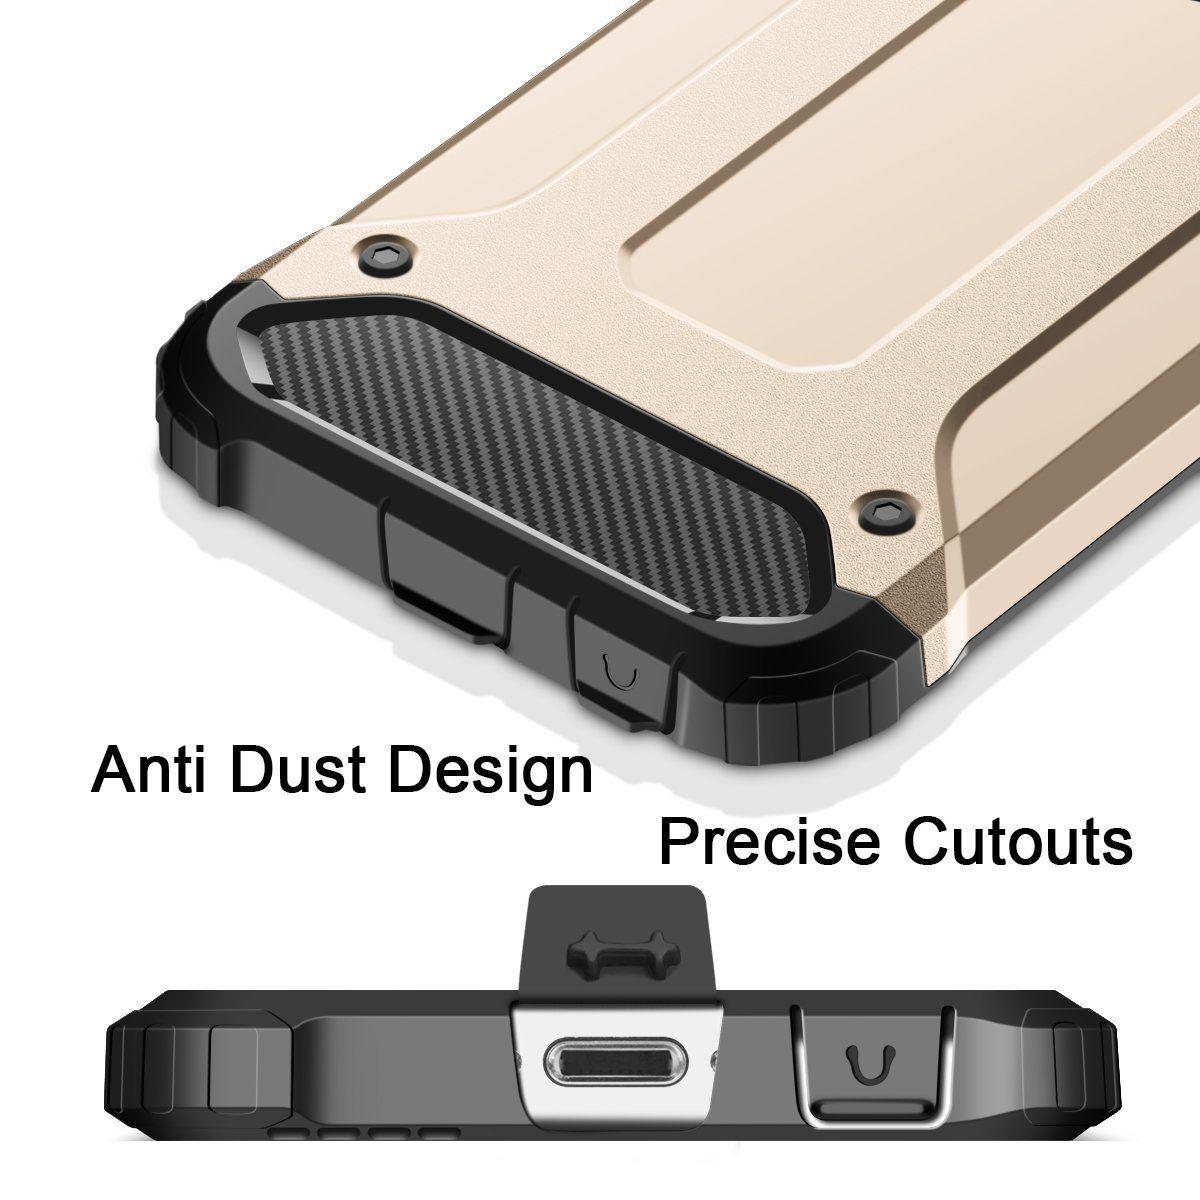 thumbnail 41 - For Apple iPhone 11 Pro Max XR Xs X 8 7 Plus 6 5 Se Case Cover Impact Heavy Duty